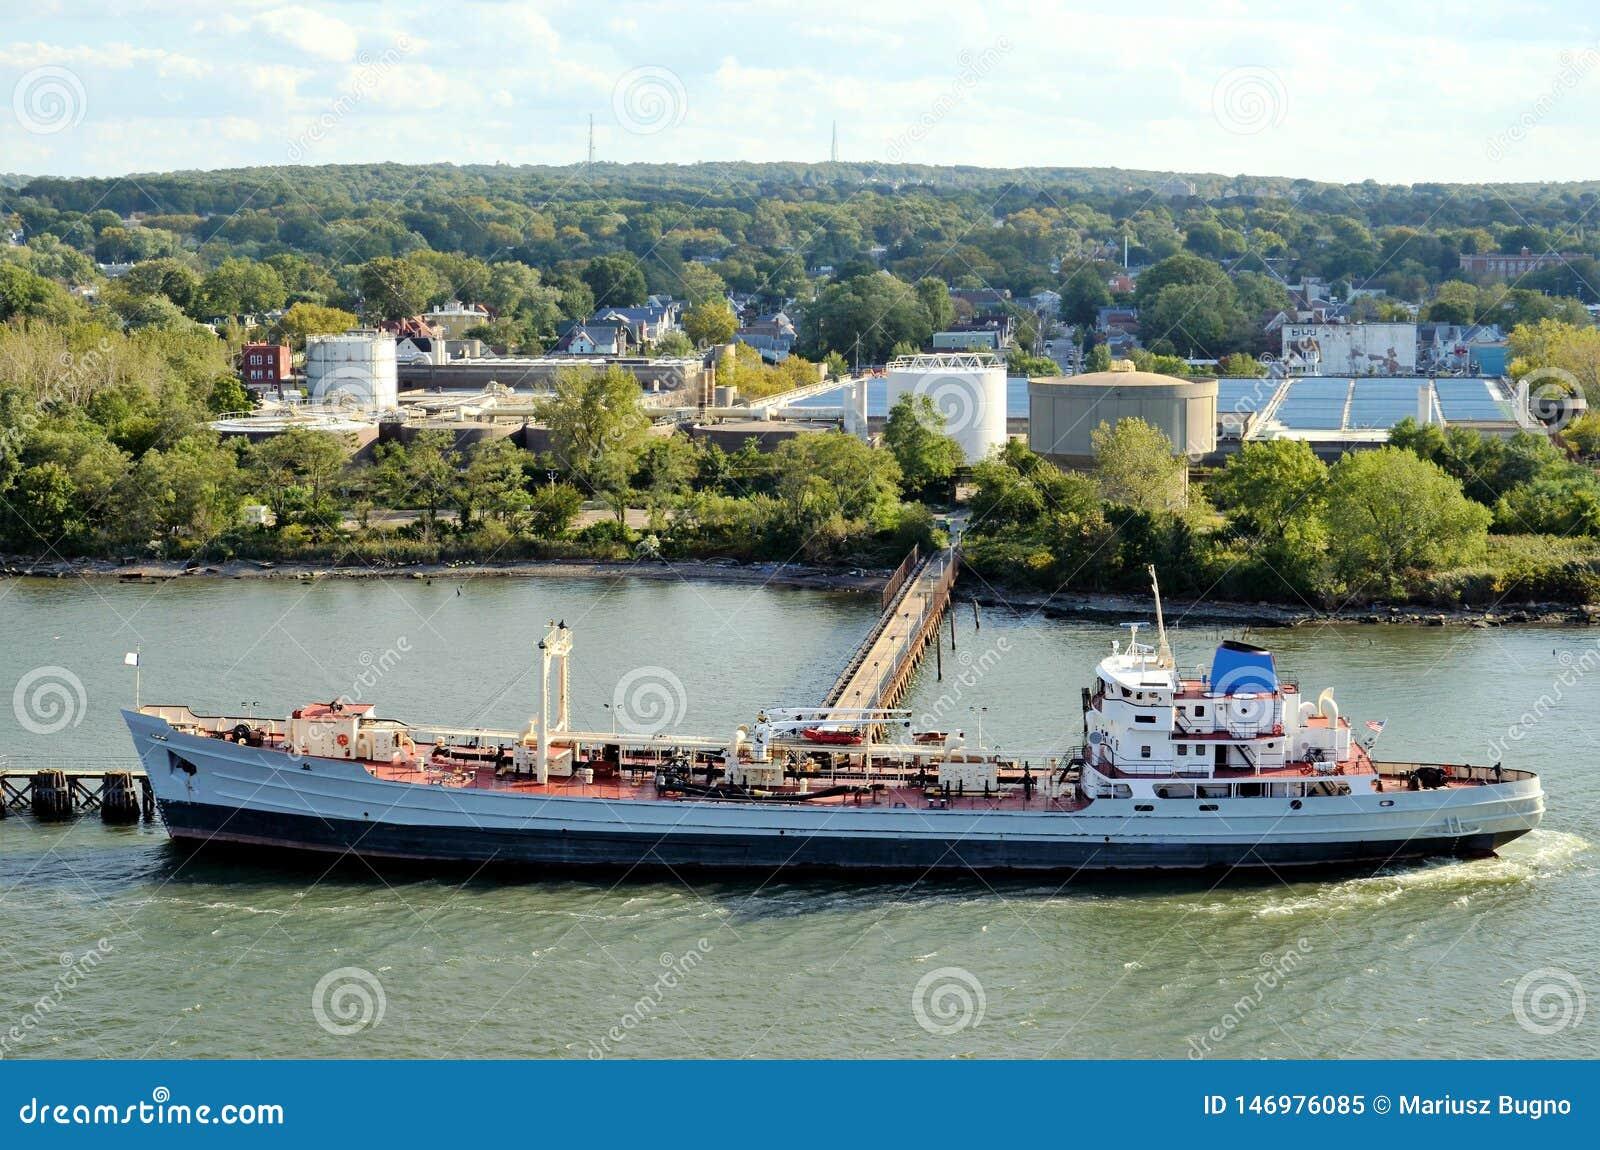 Pétrolier prenant sa cargaison, Bayonne dans le New Jersey